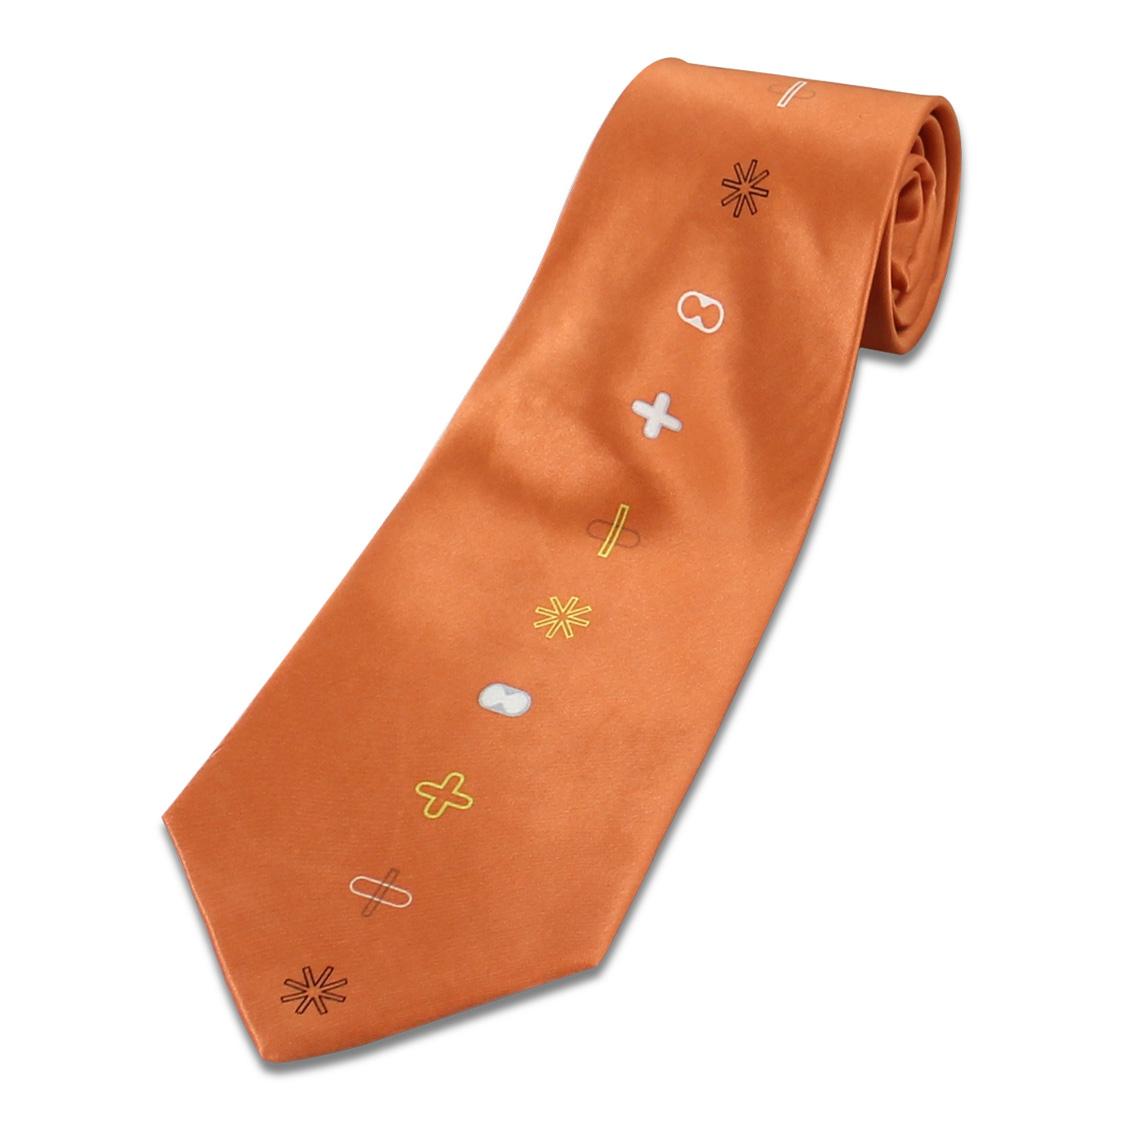 b1286e2b05a1 Shop ORANGE Neck Tie by Karim Rashid (#TKR02) on ACME Studio